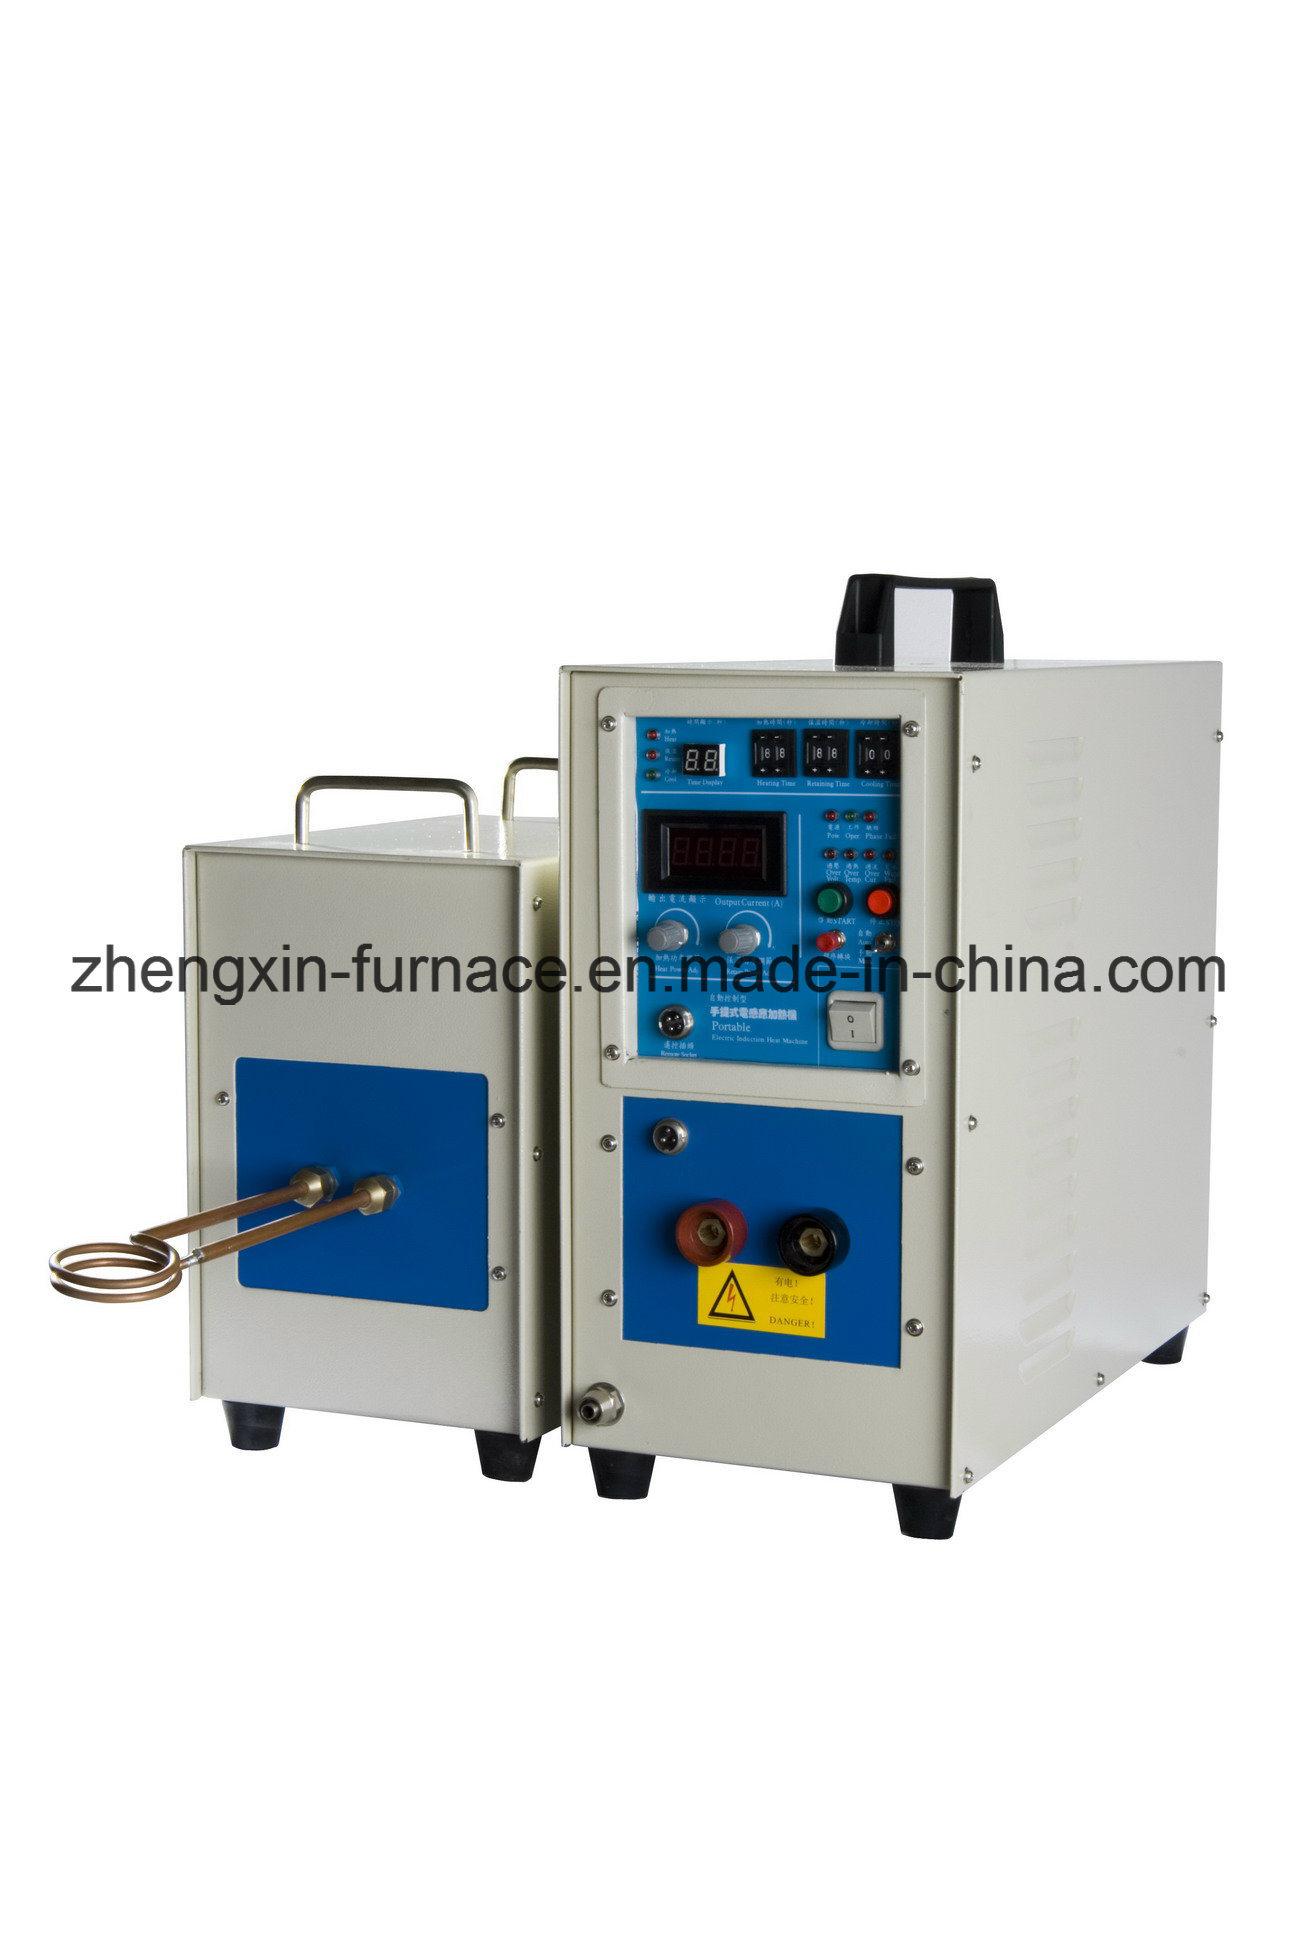 China Medium Frequency Igbt Induction Heating Machine 25kw Iii With Heater Furnace